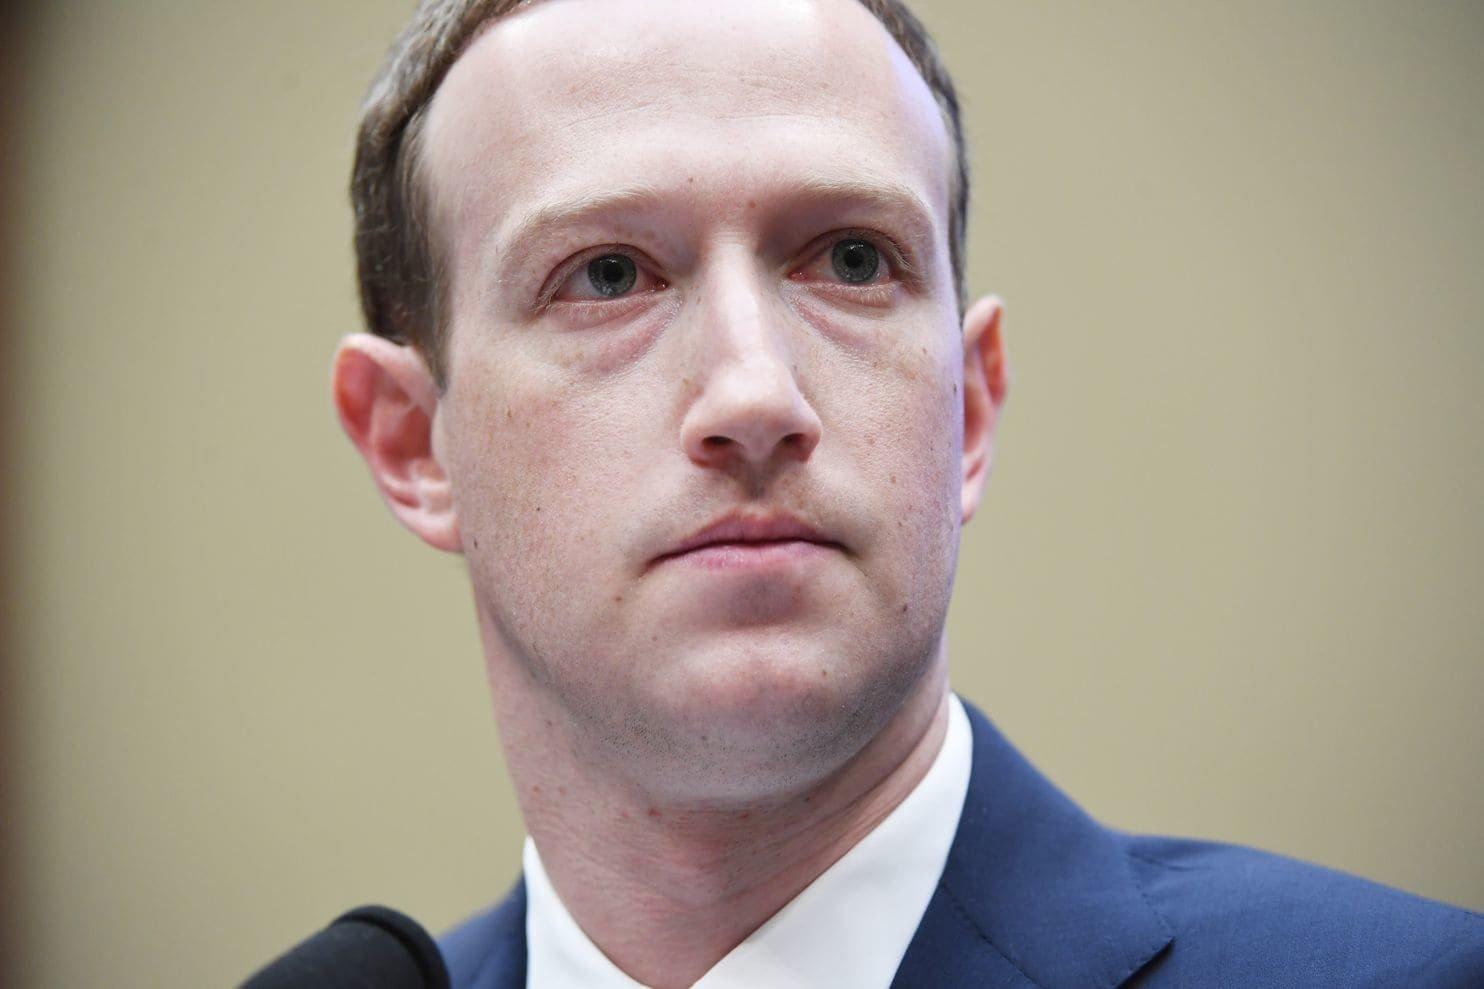 Mark Zuckerberg - advertiser